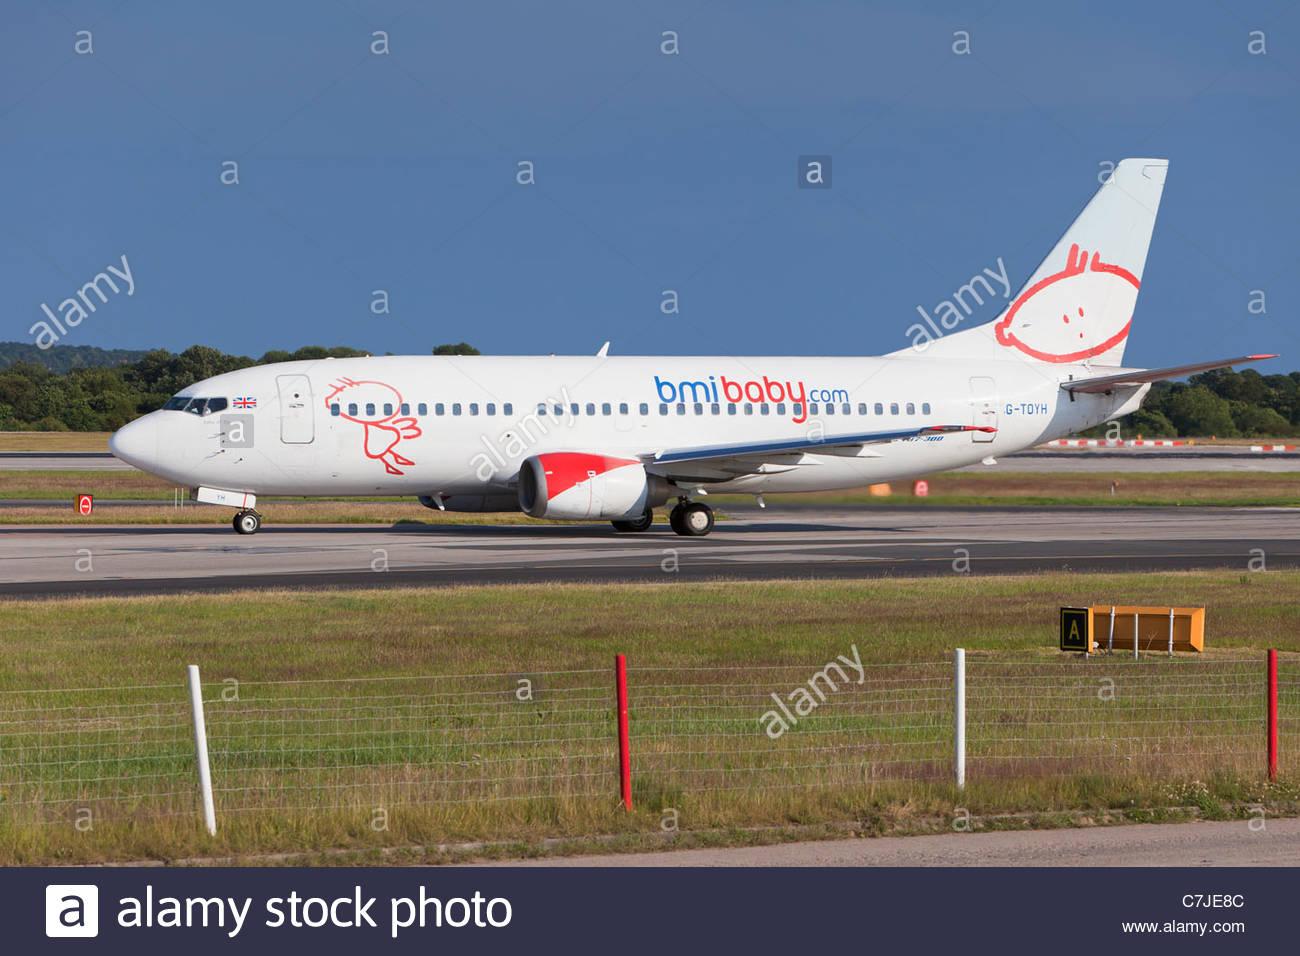 BMI Baby aircraft, England - Stock Image